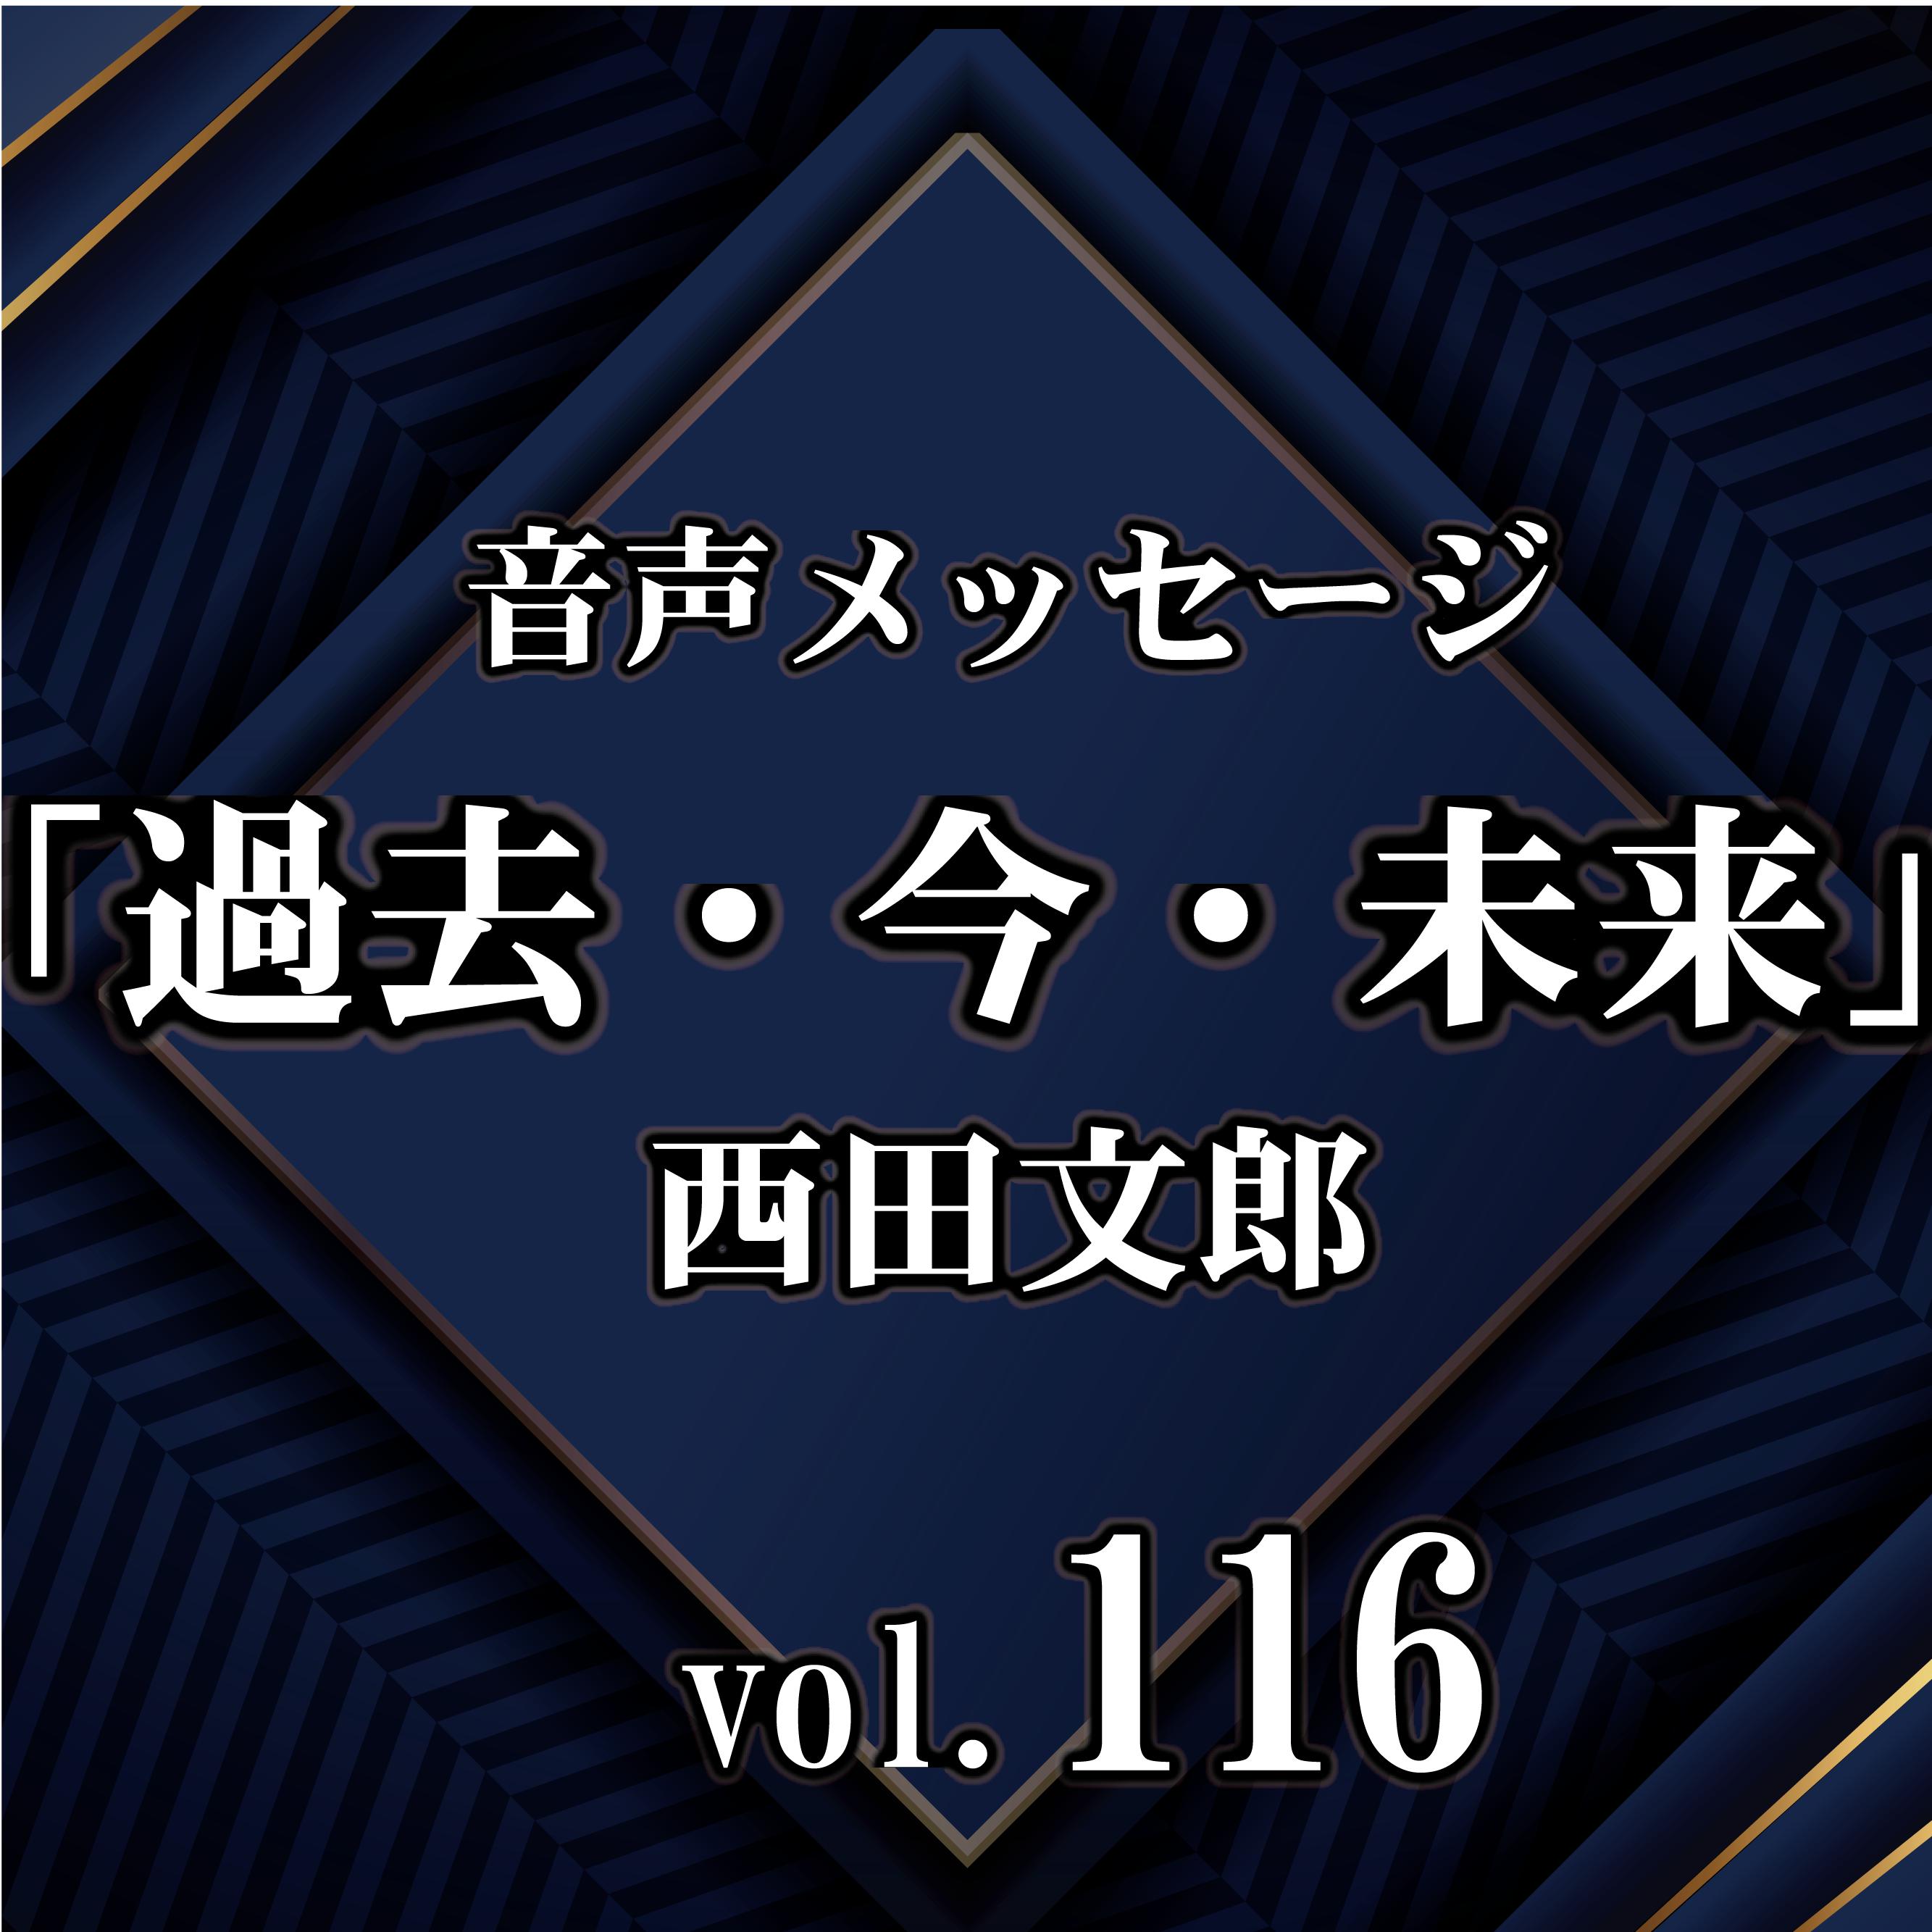 西田文郎 音声メッセージvol.116『過去・今・未来』